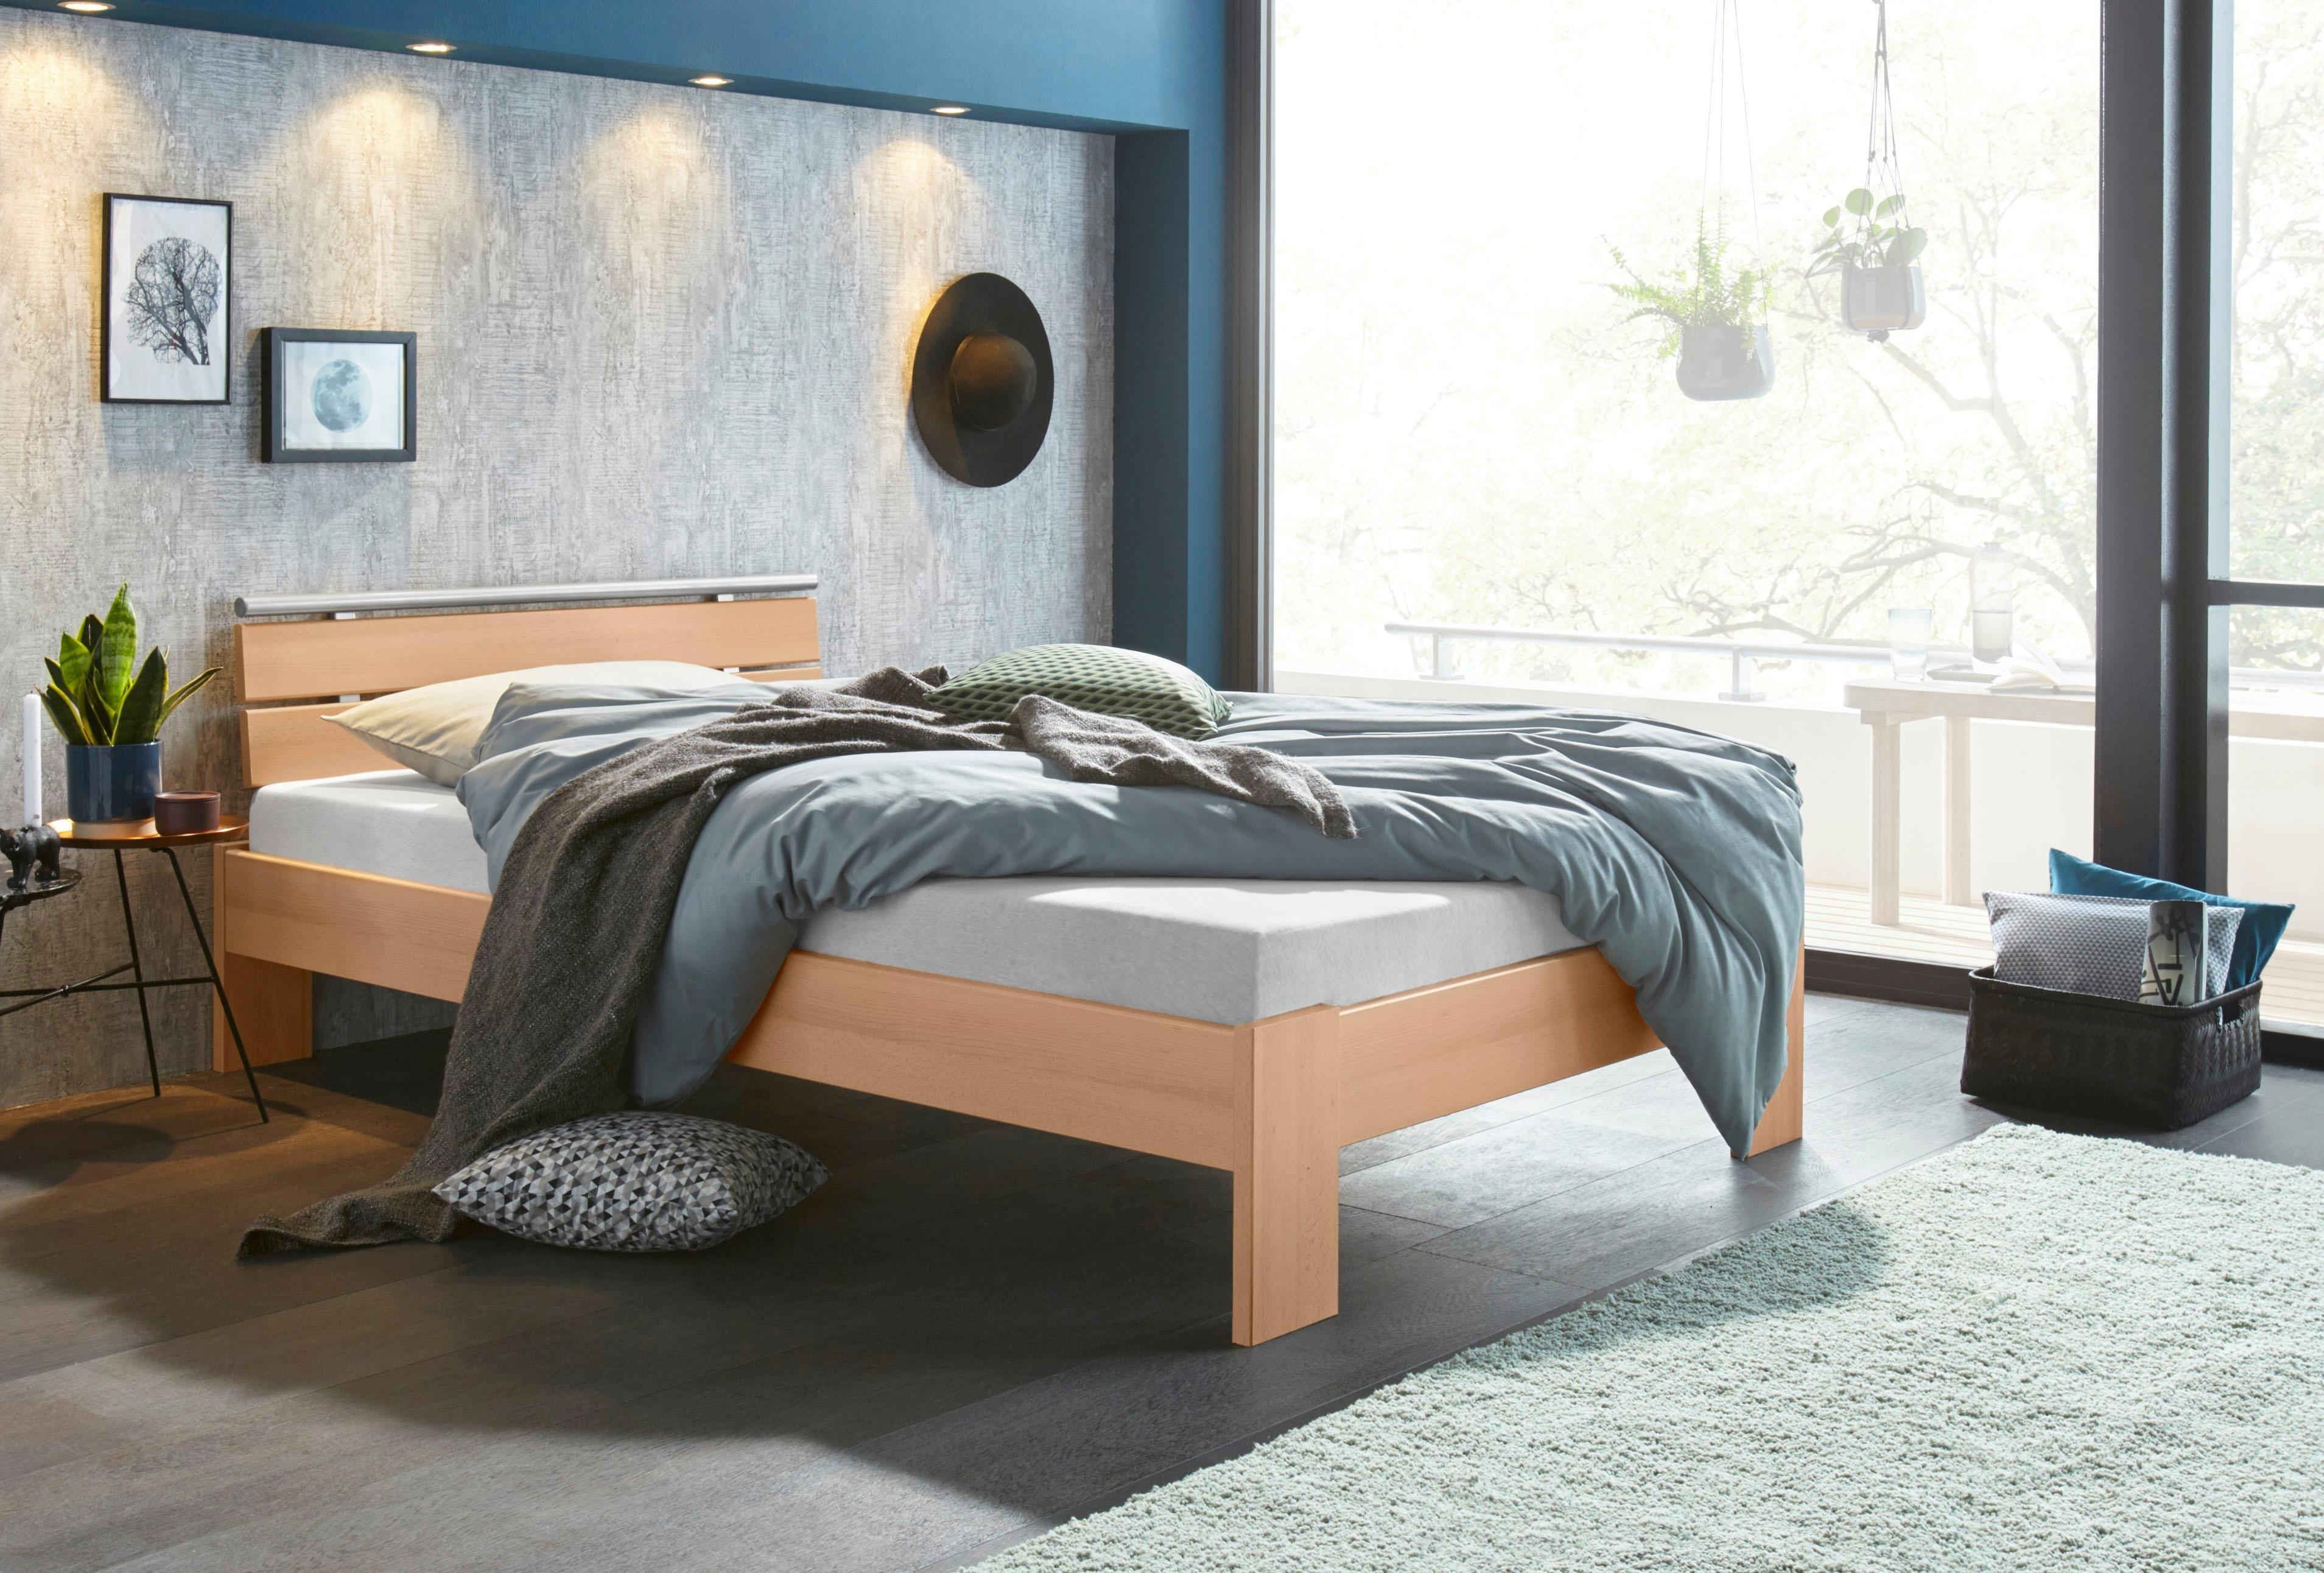 Futonbett | Schlafzimmer > Betten > Futonbetten | Federn - Massivholz